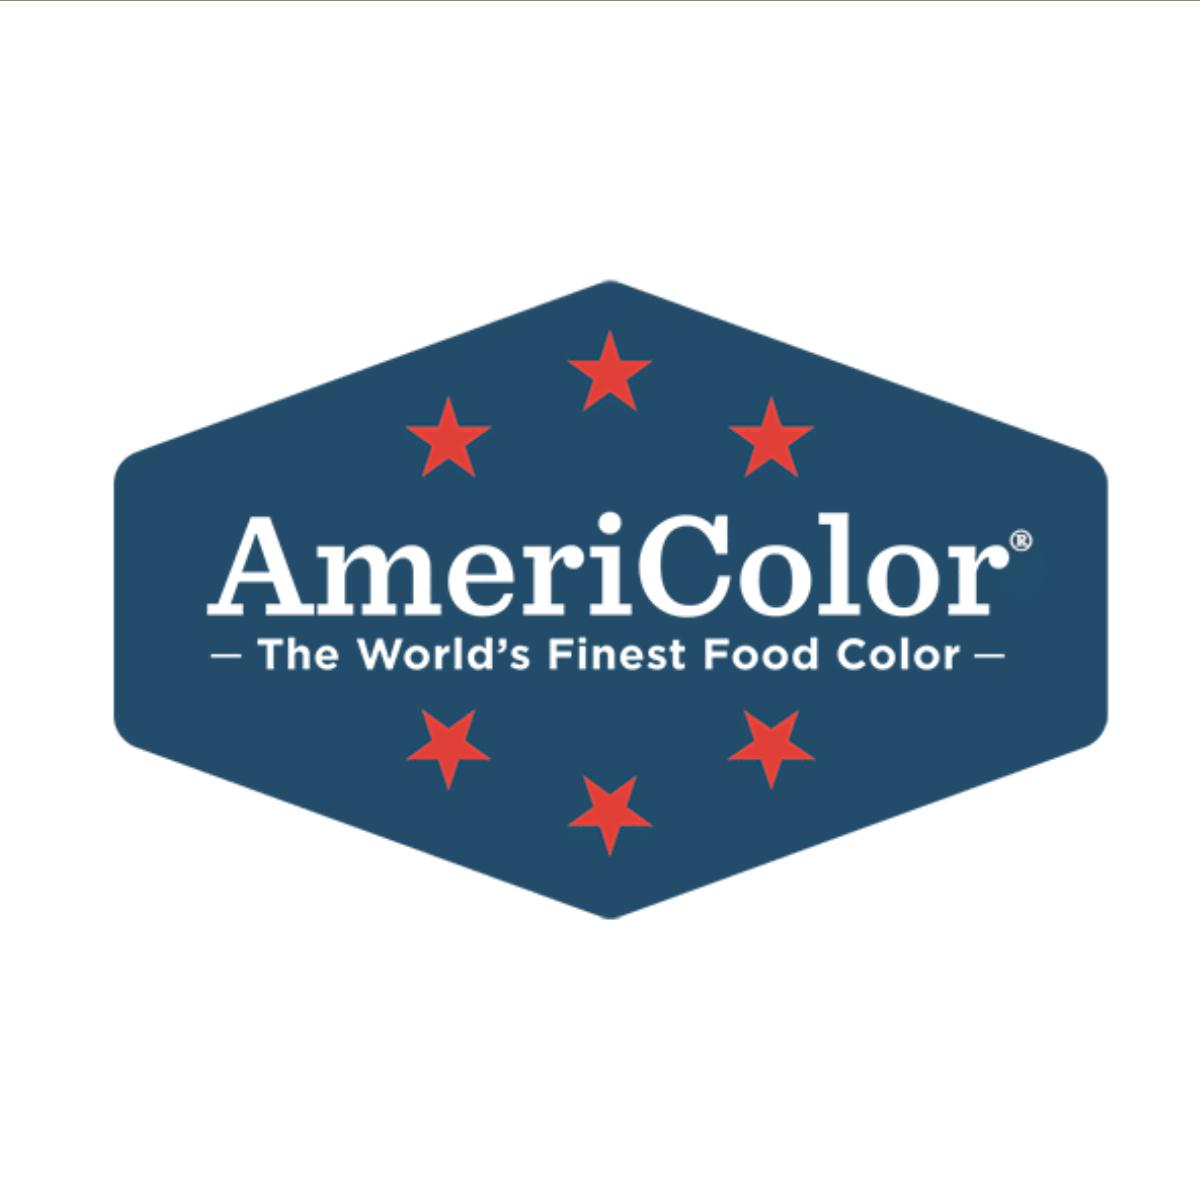 americolor-1-.jpg